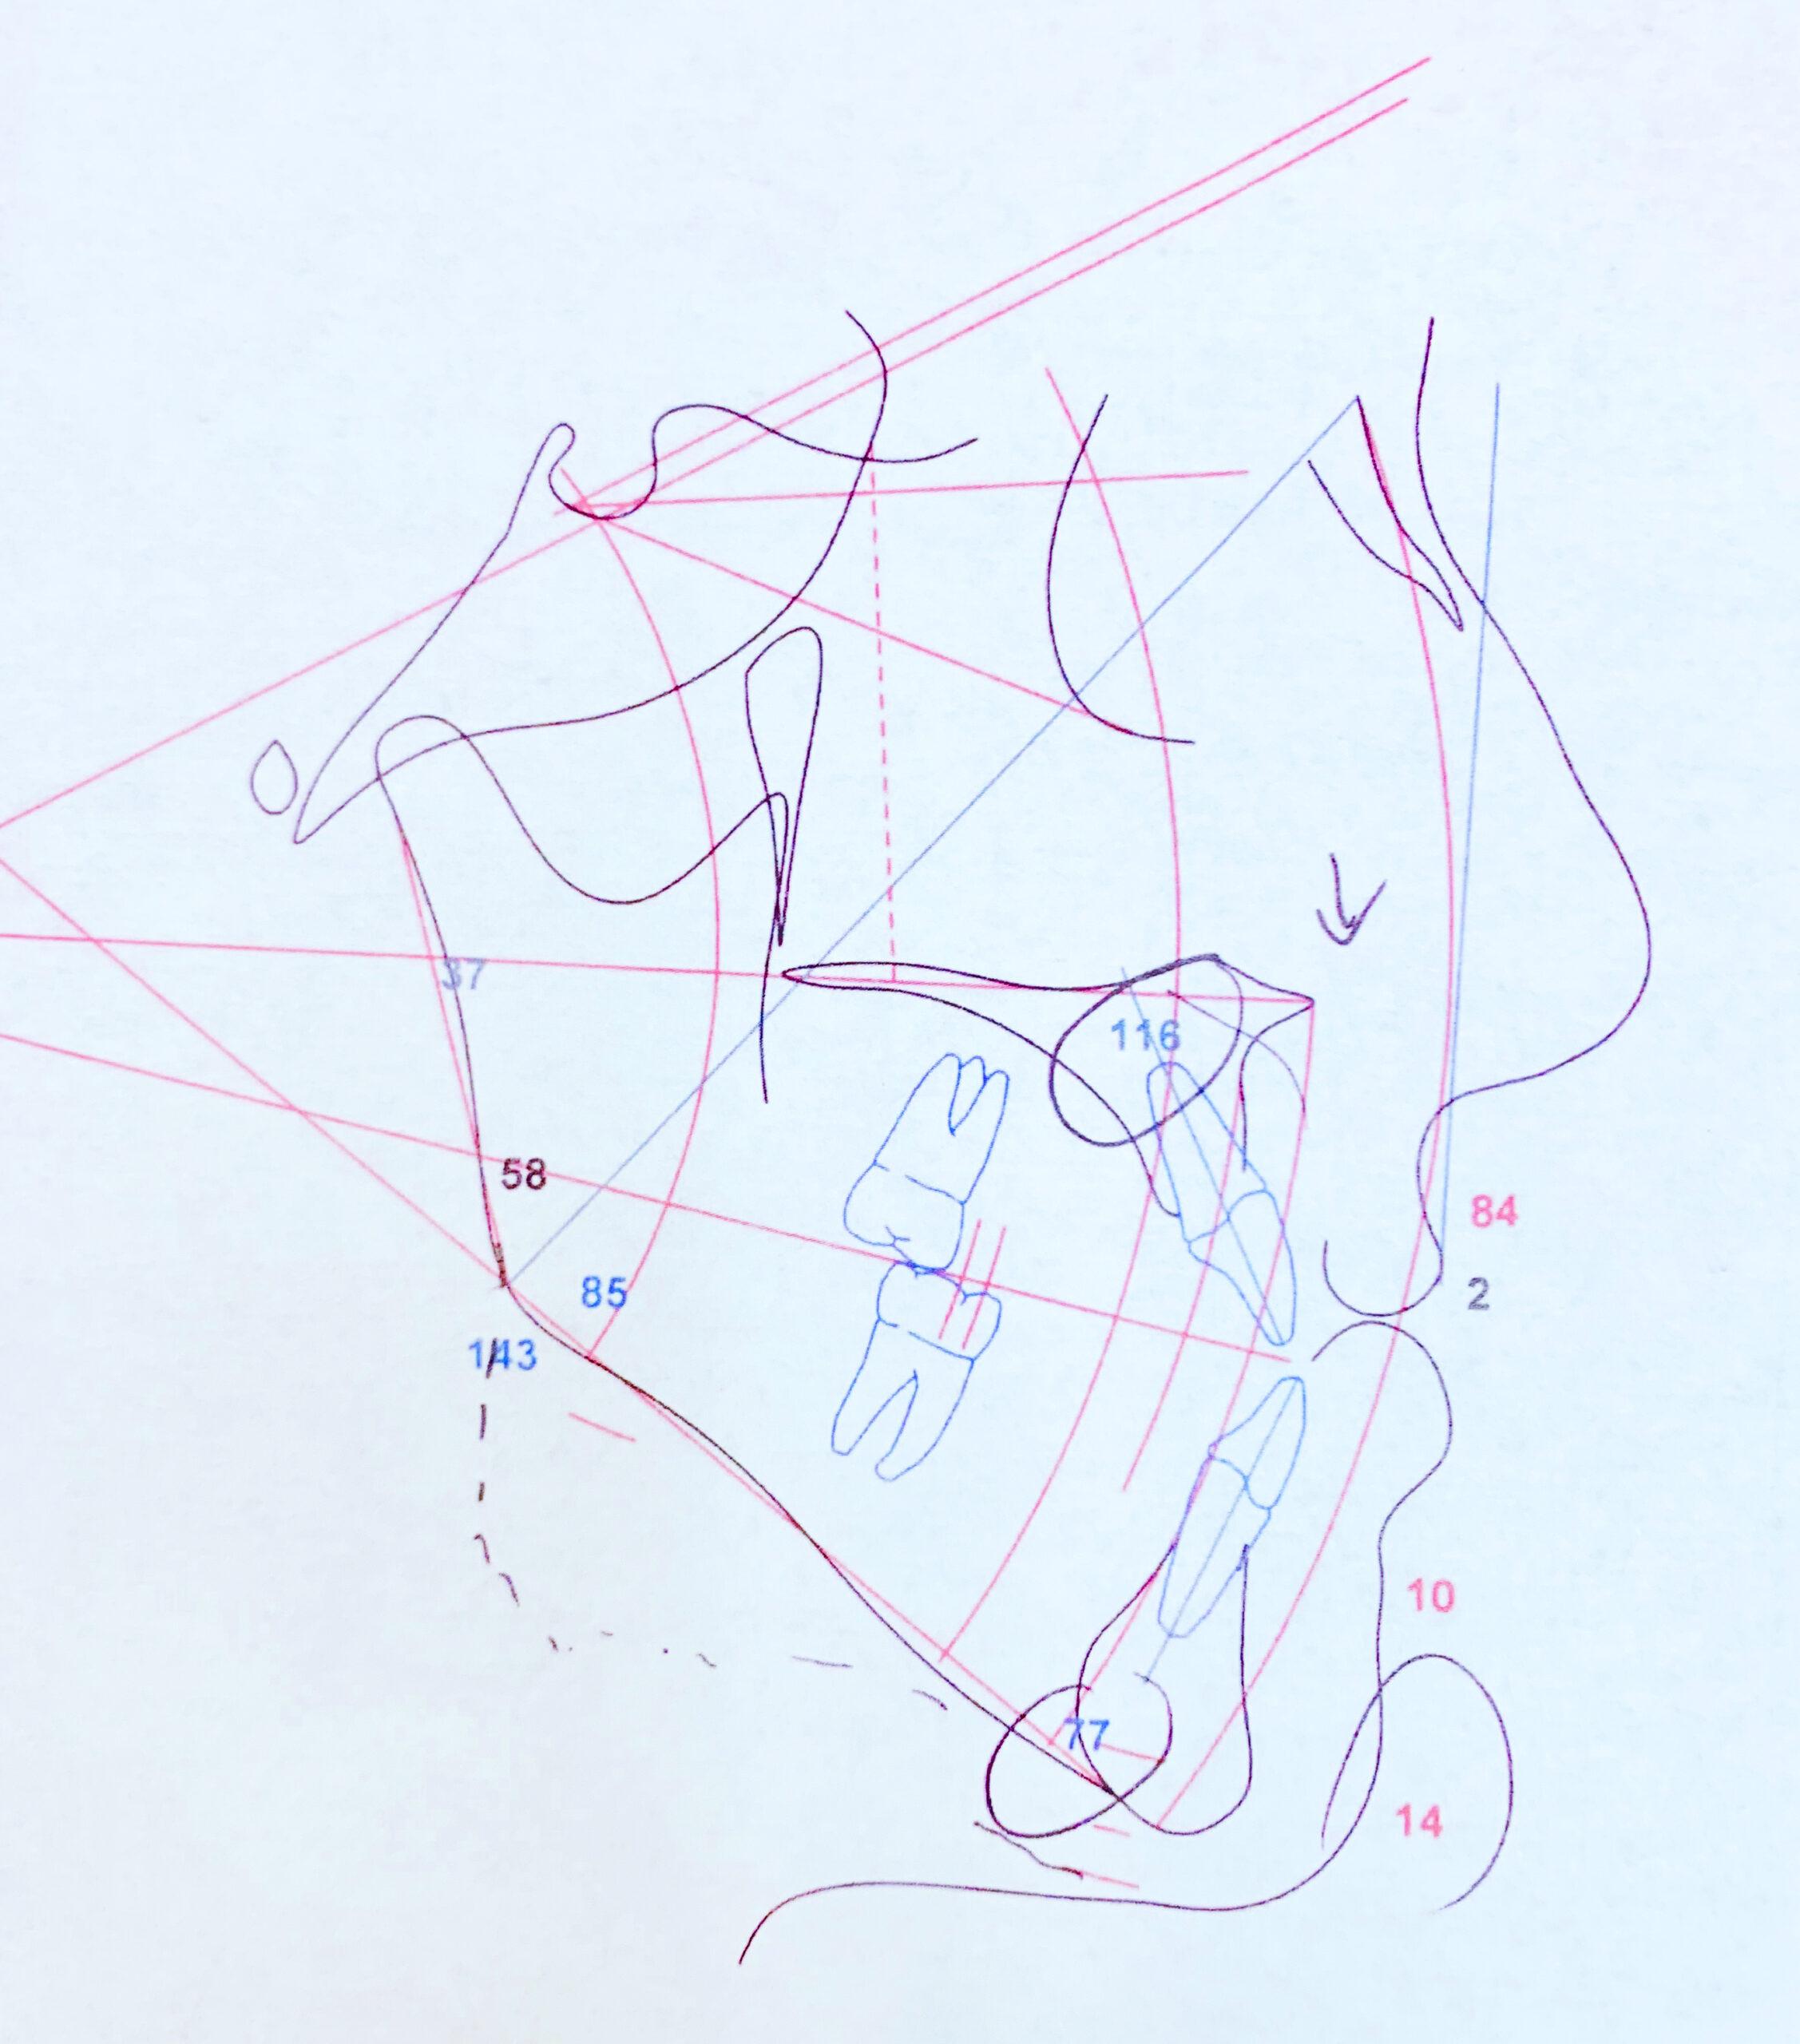 celph analysis